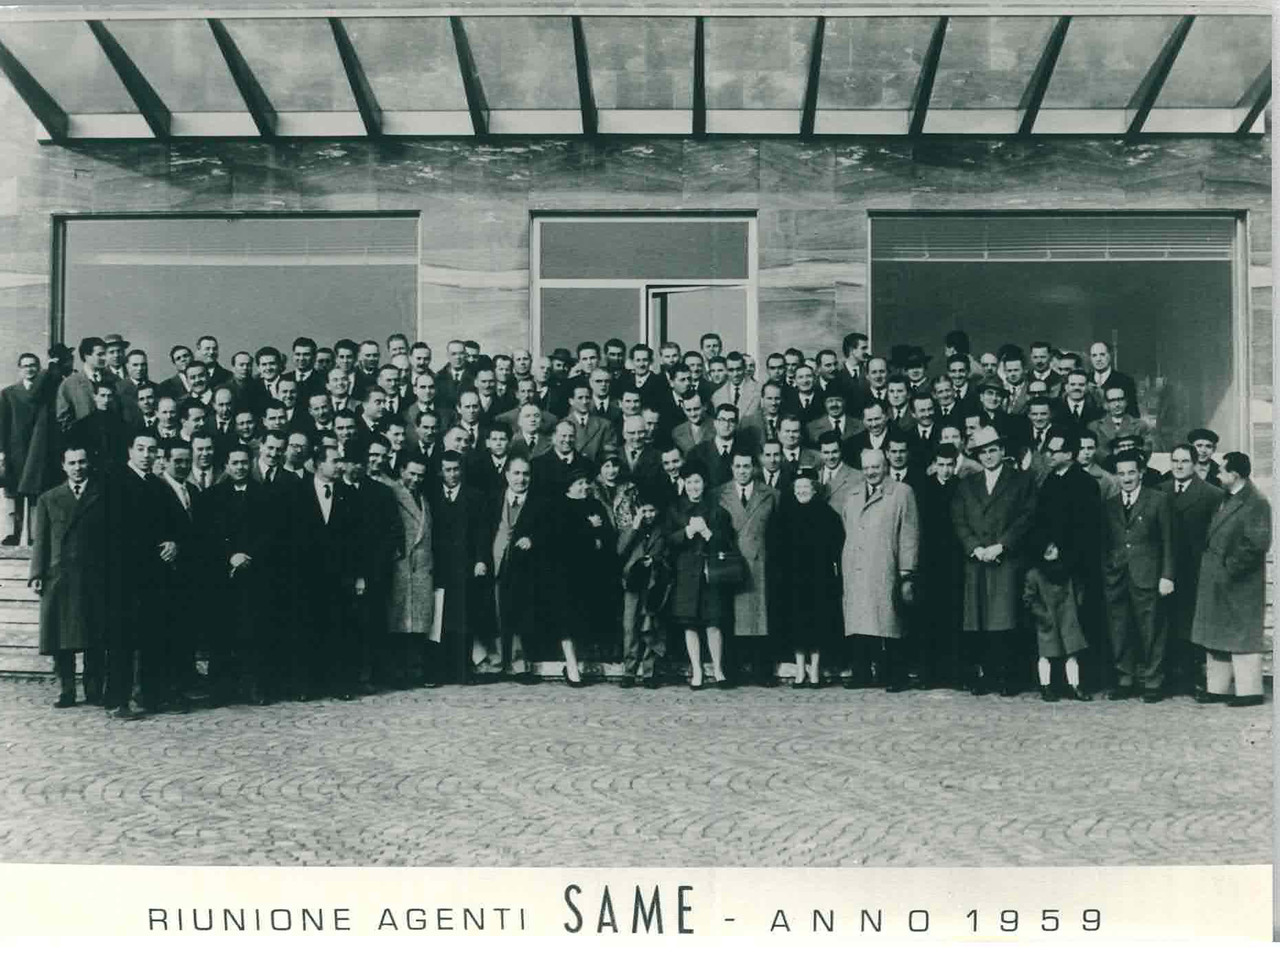 Riunione Agenti SAME